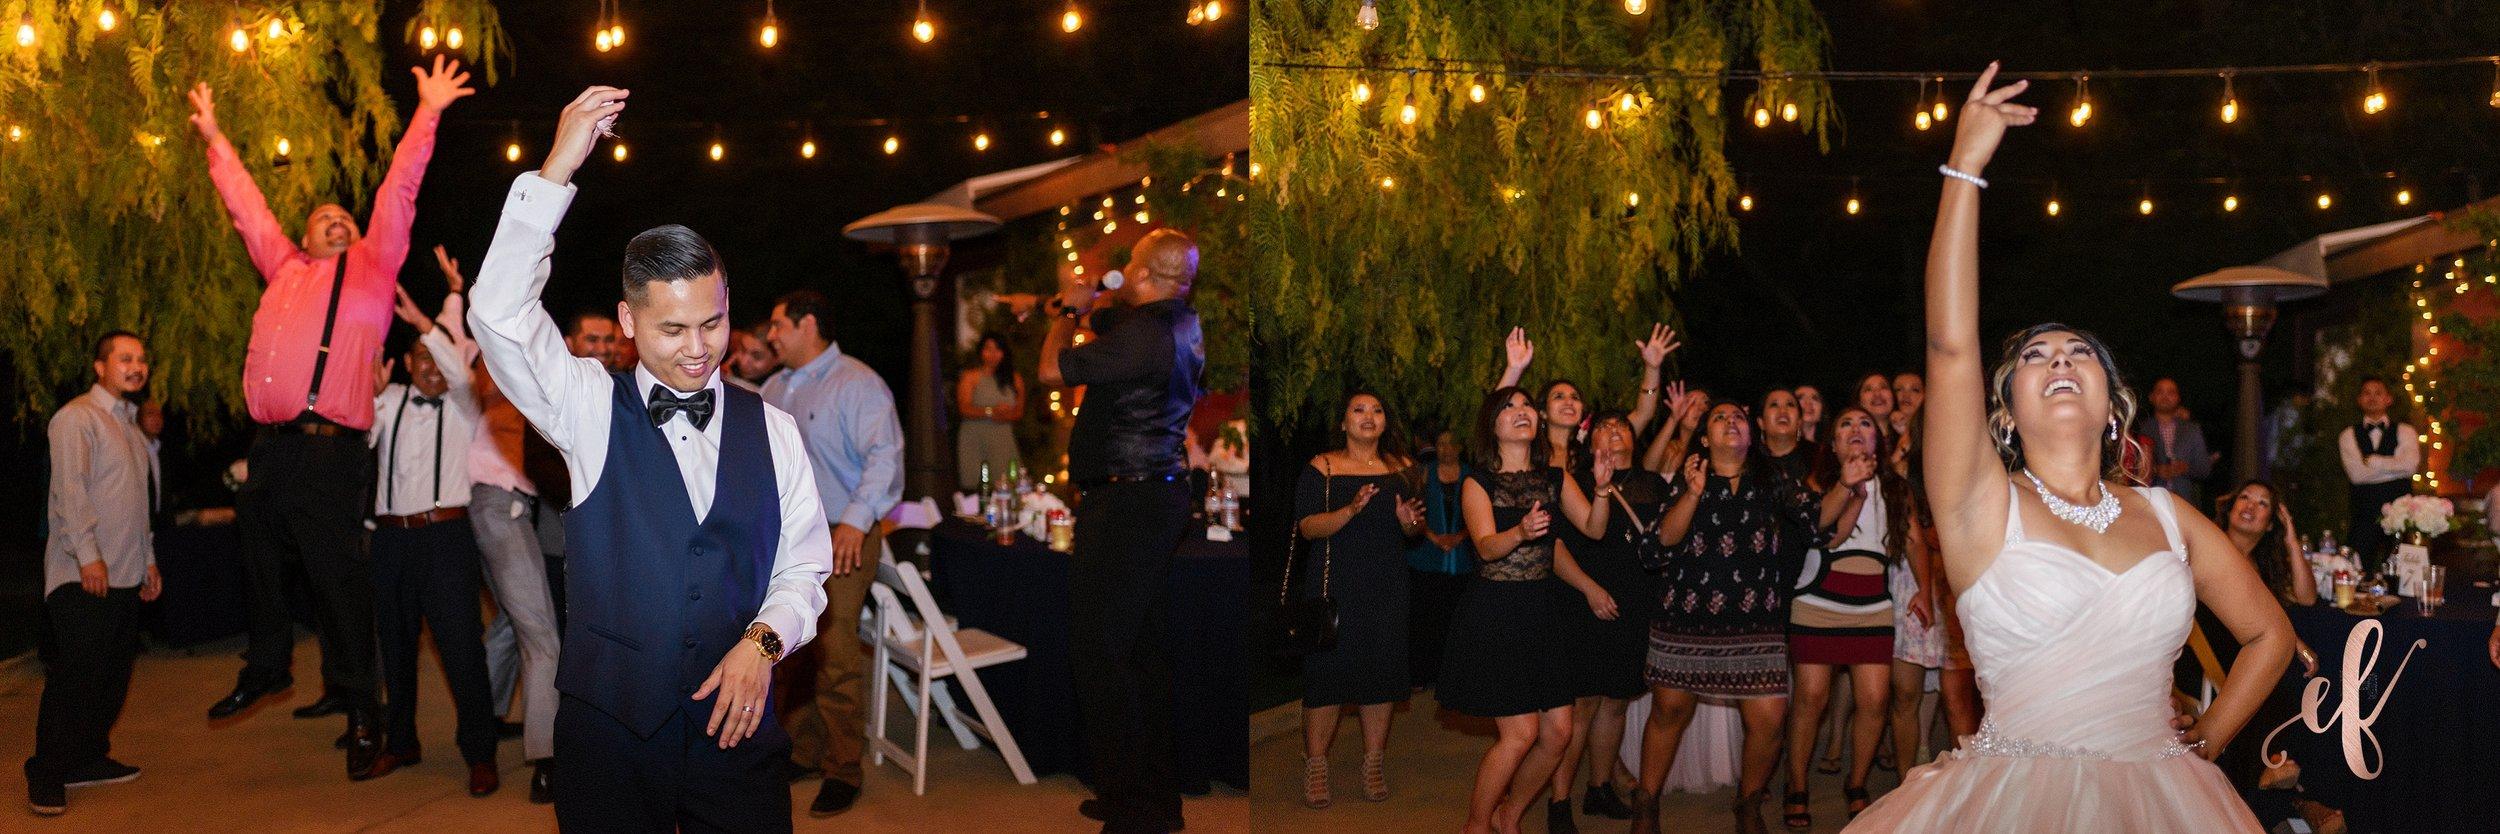 Be Still Photog San Diego Wedding Photographer_0894.jpg